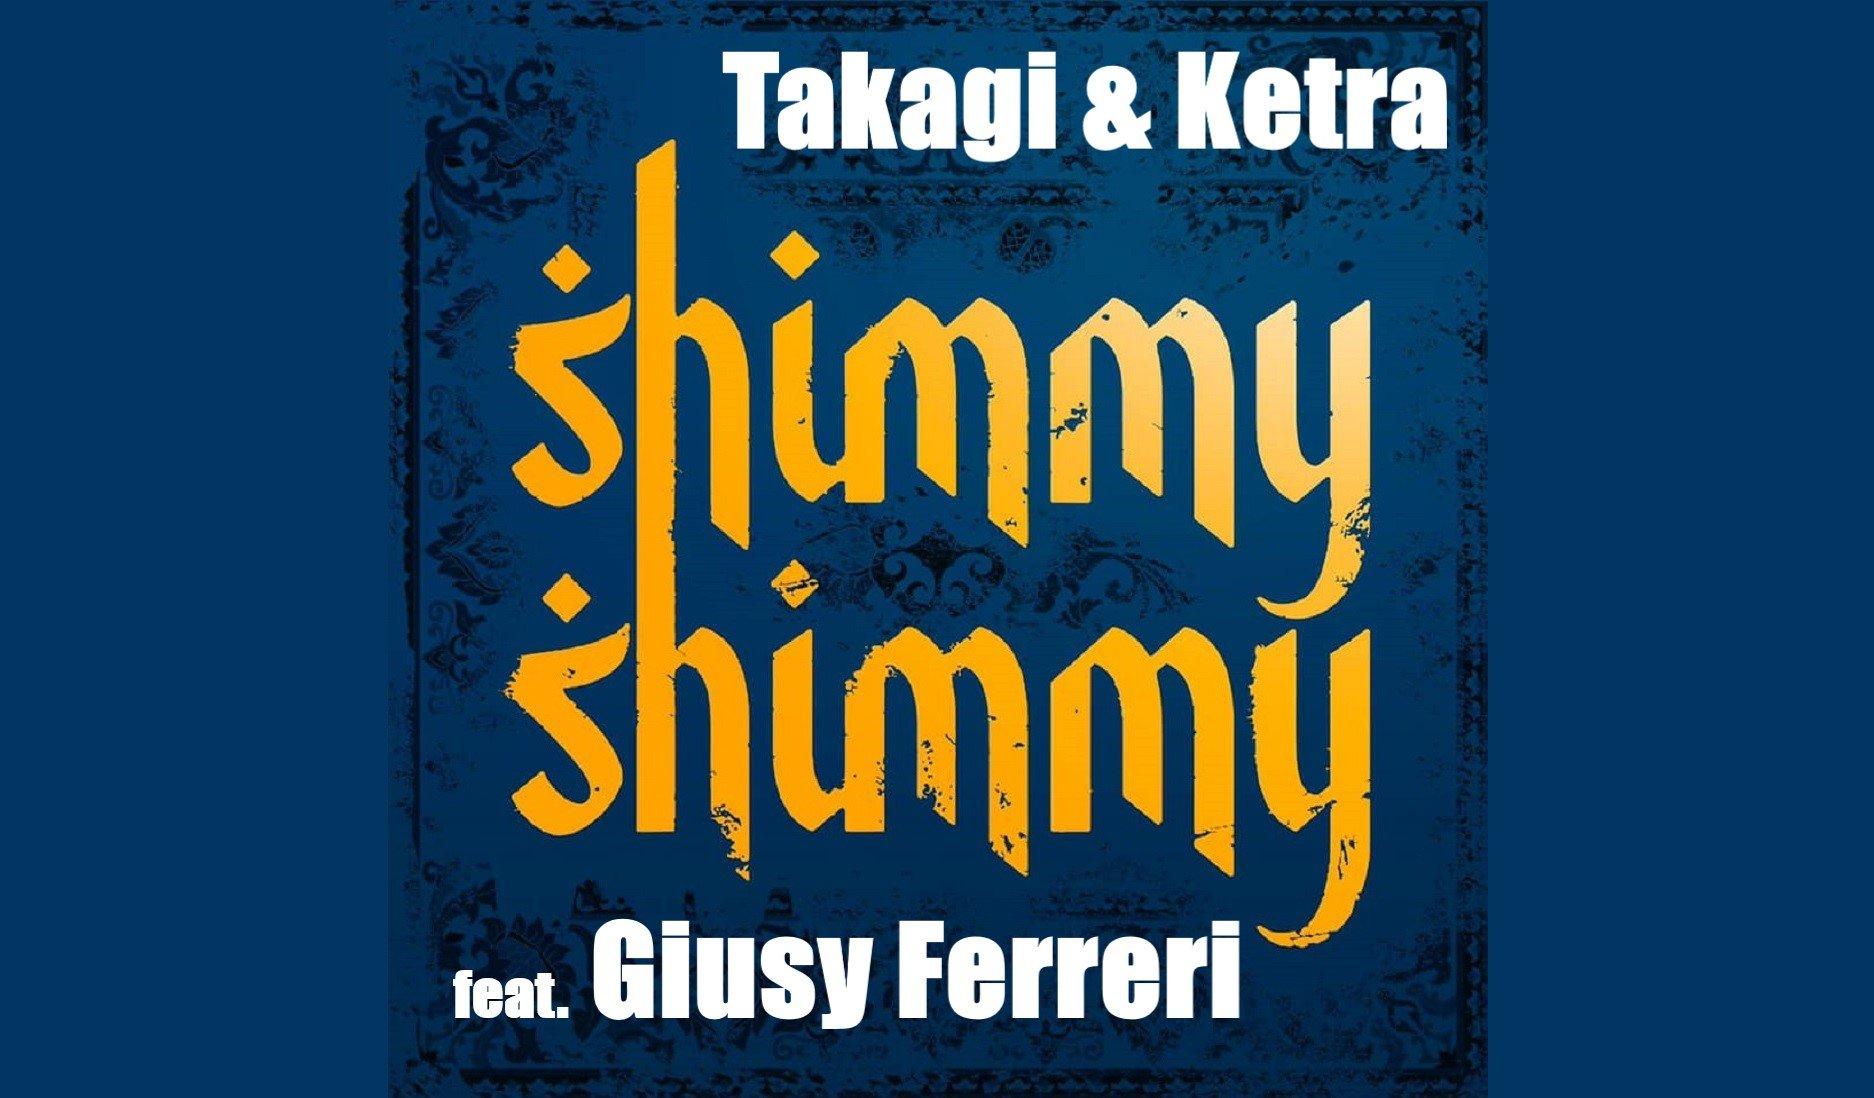 Takagi Ketra feat. Giusy Ferreri SHIMMY SHIMMY 1